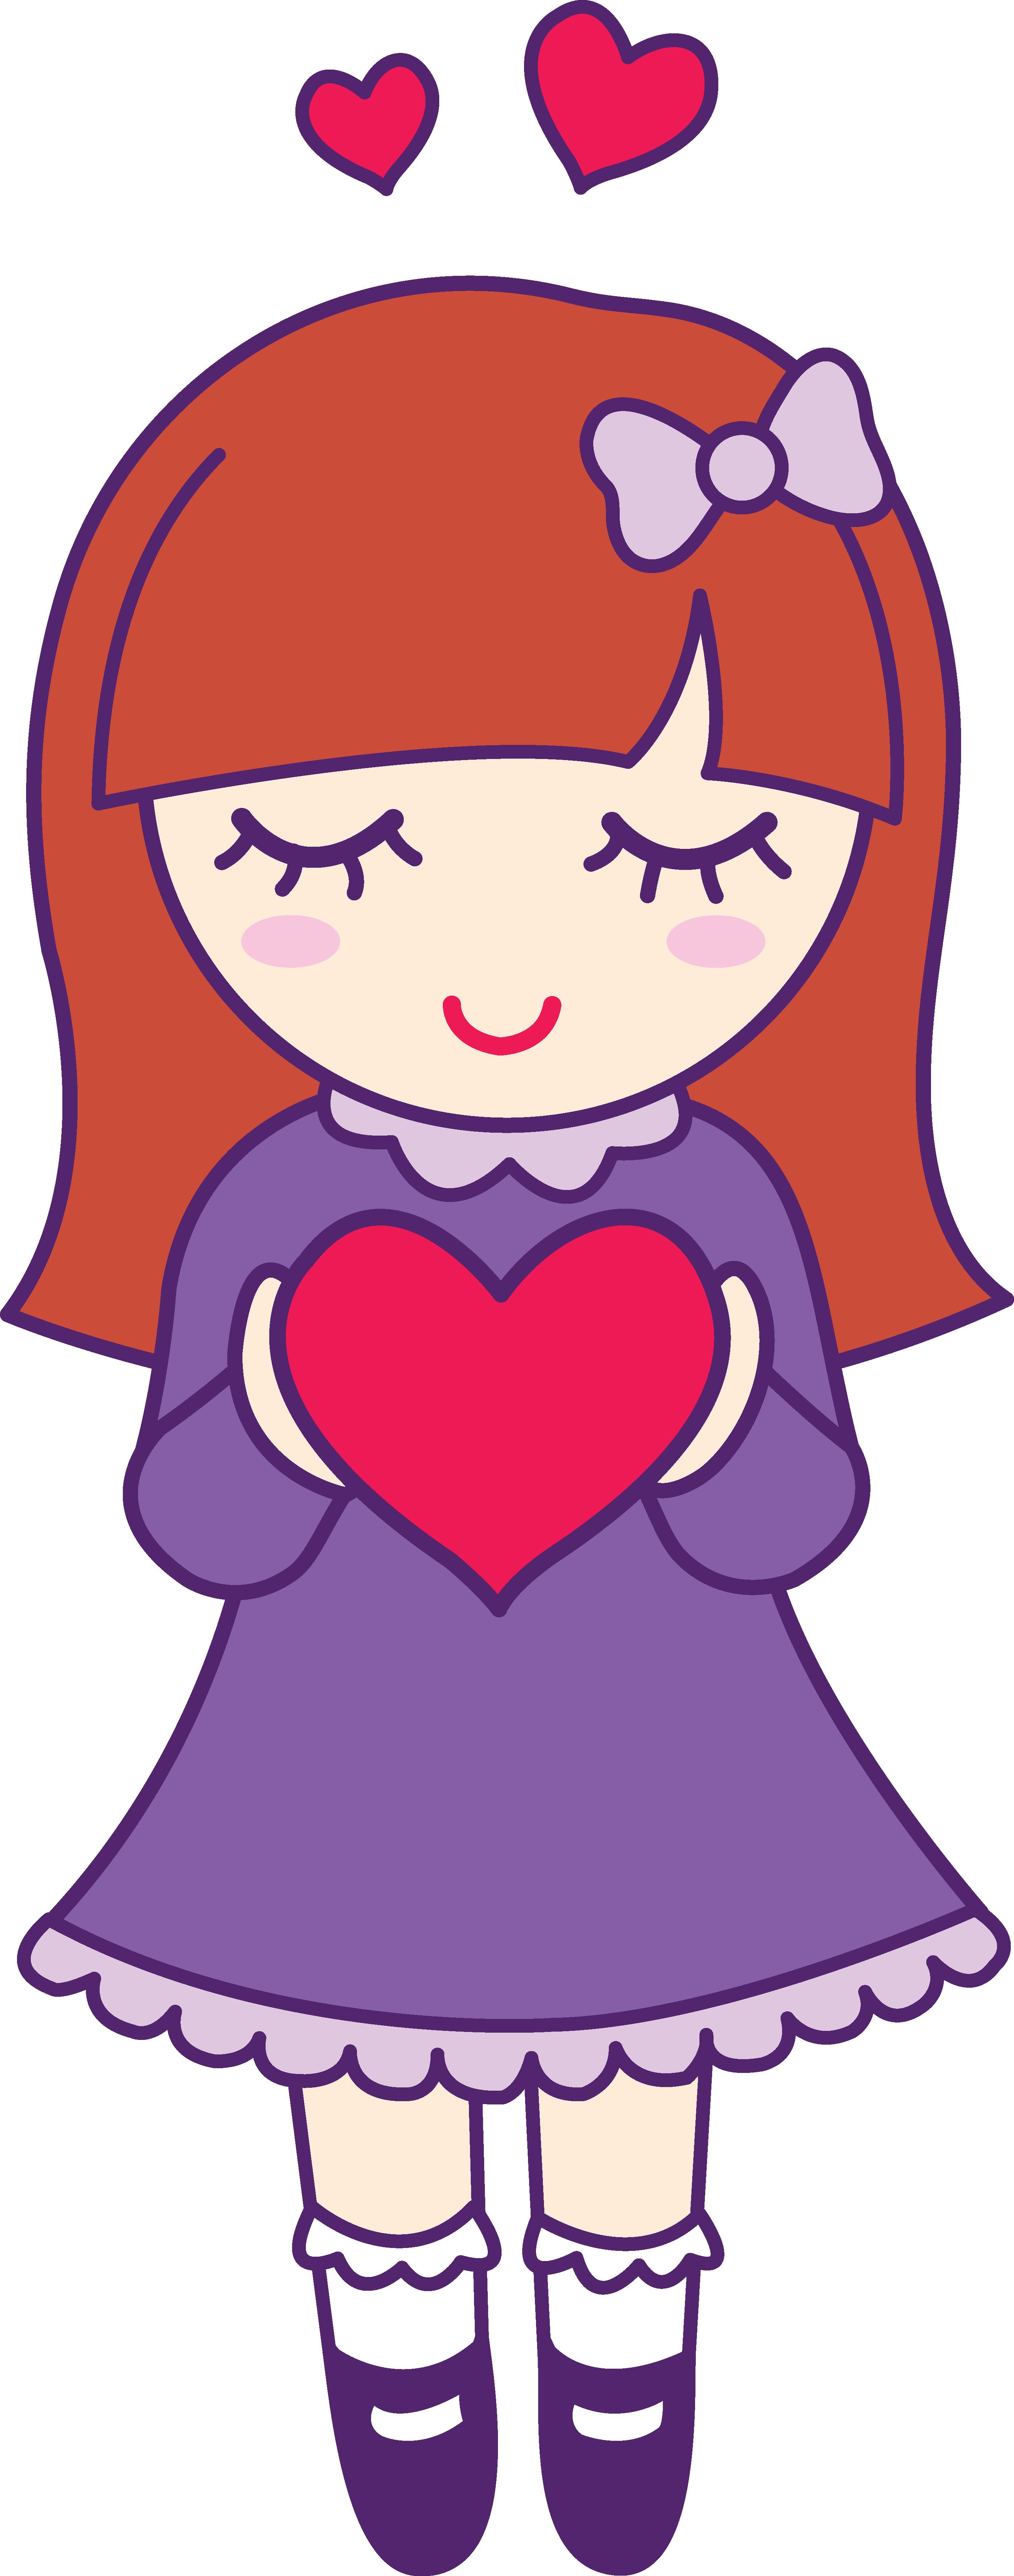 2798x7107 Hearts Clipart Girly